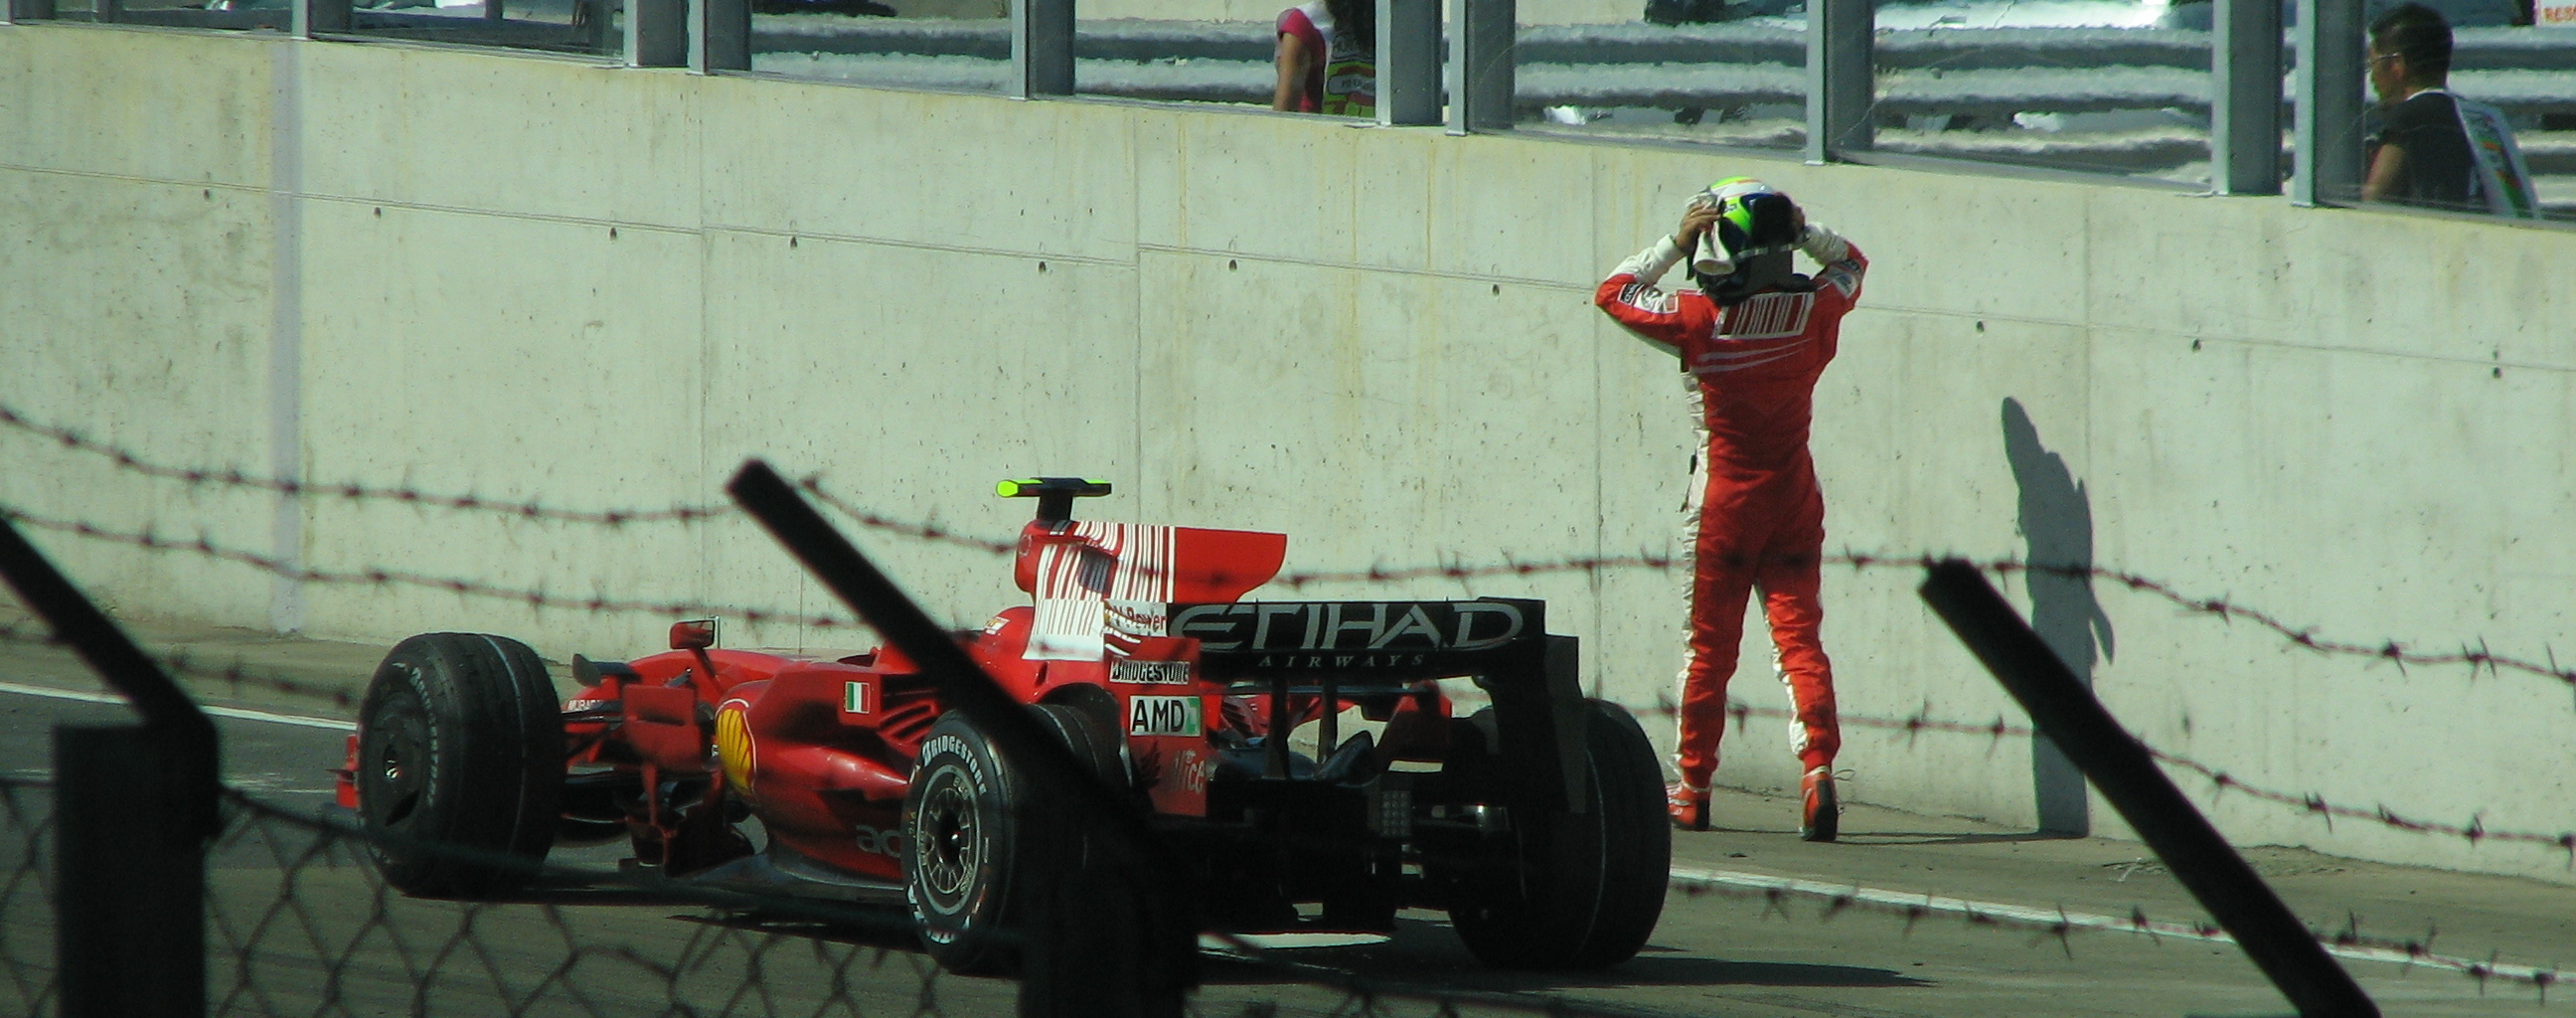 felipe_massa_car_crash.JPG